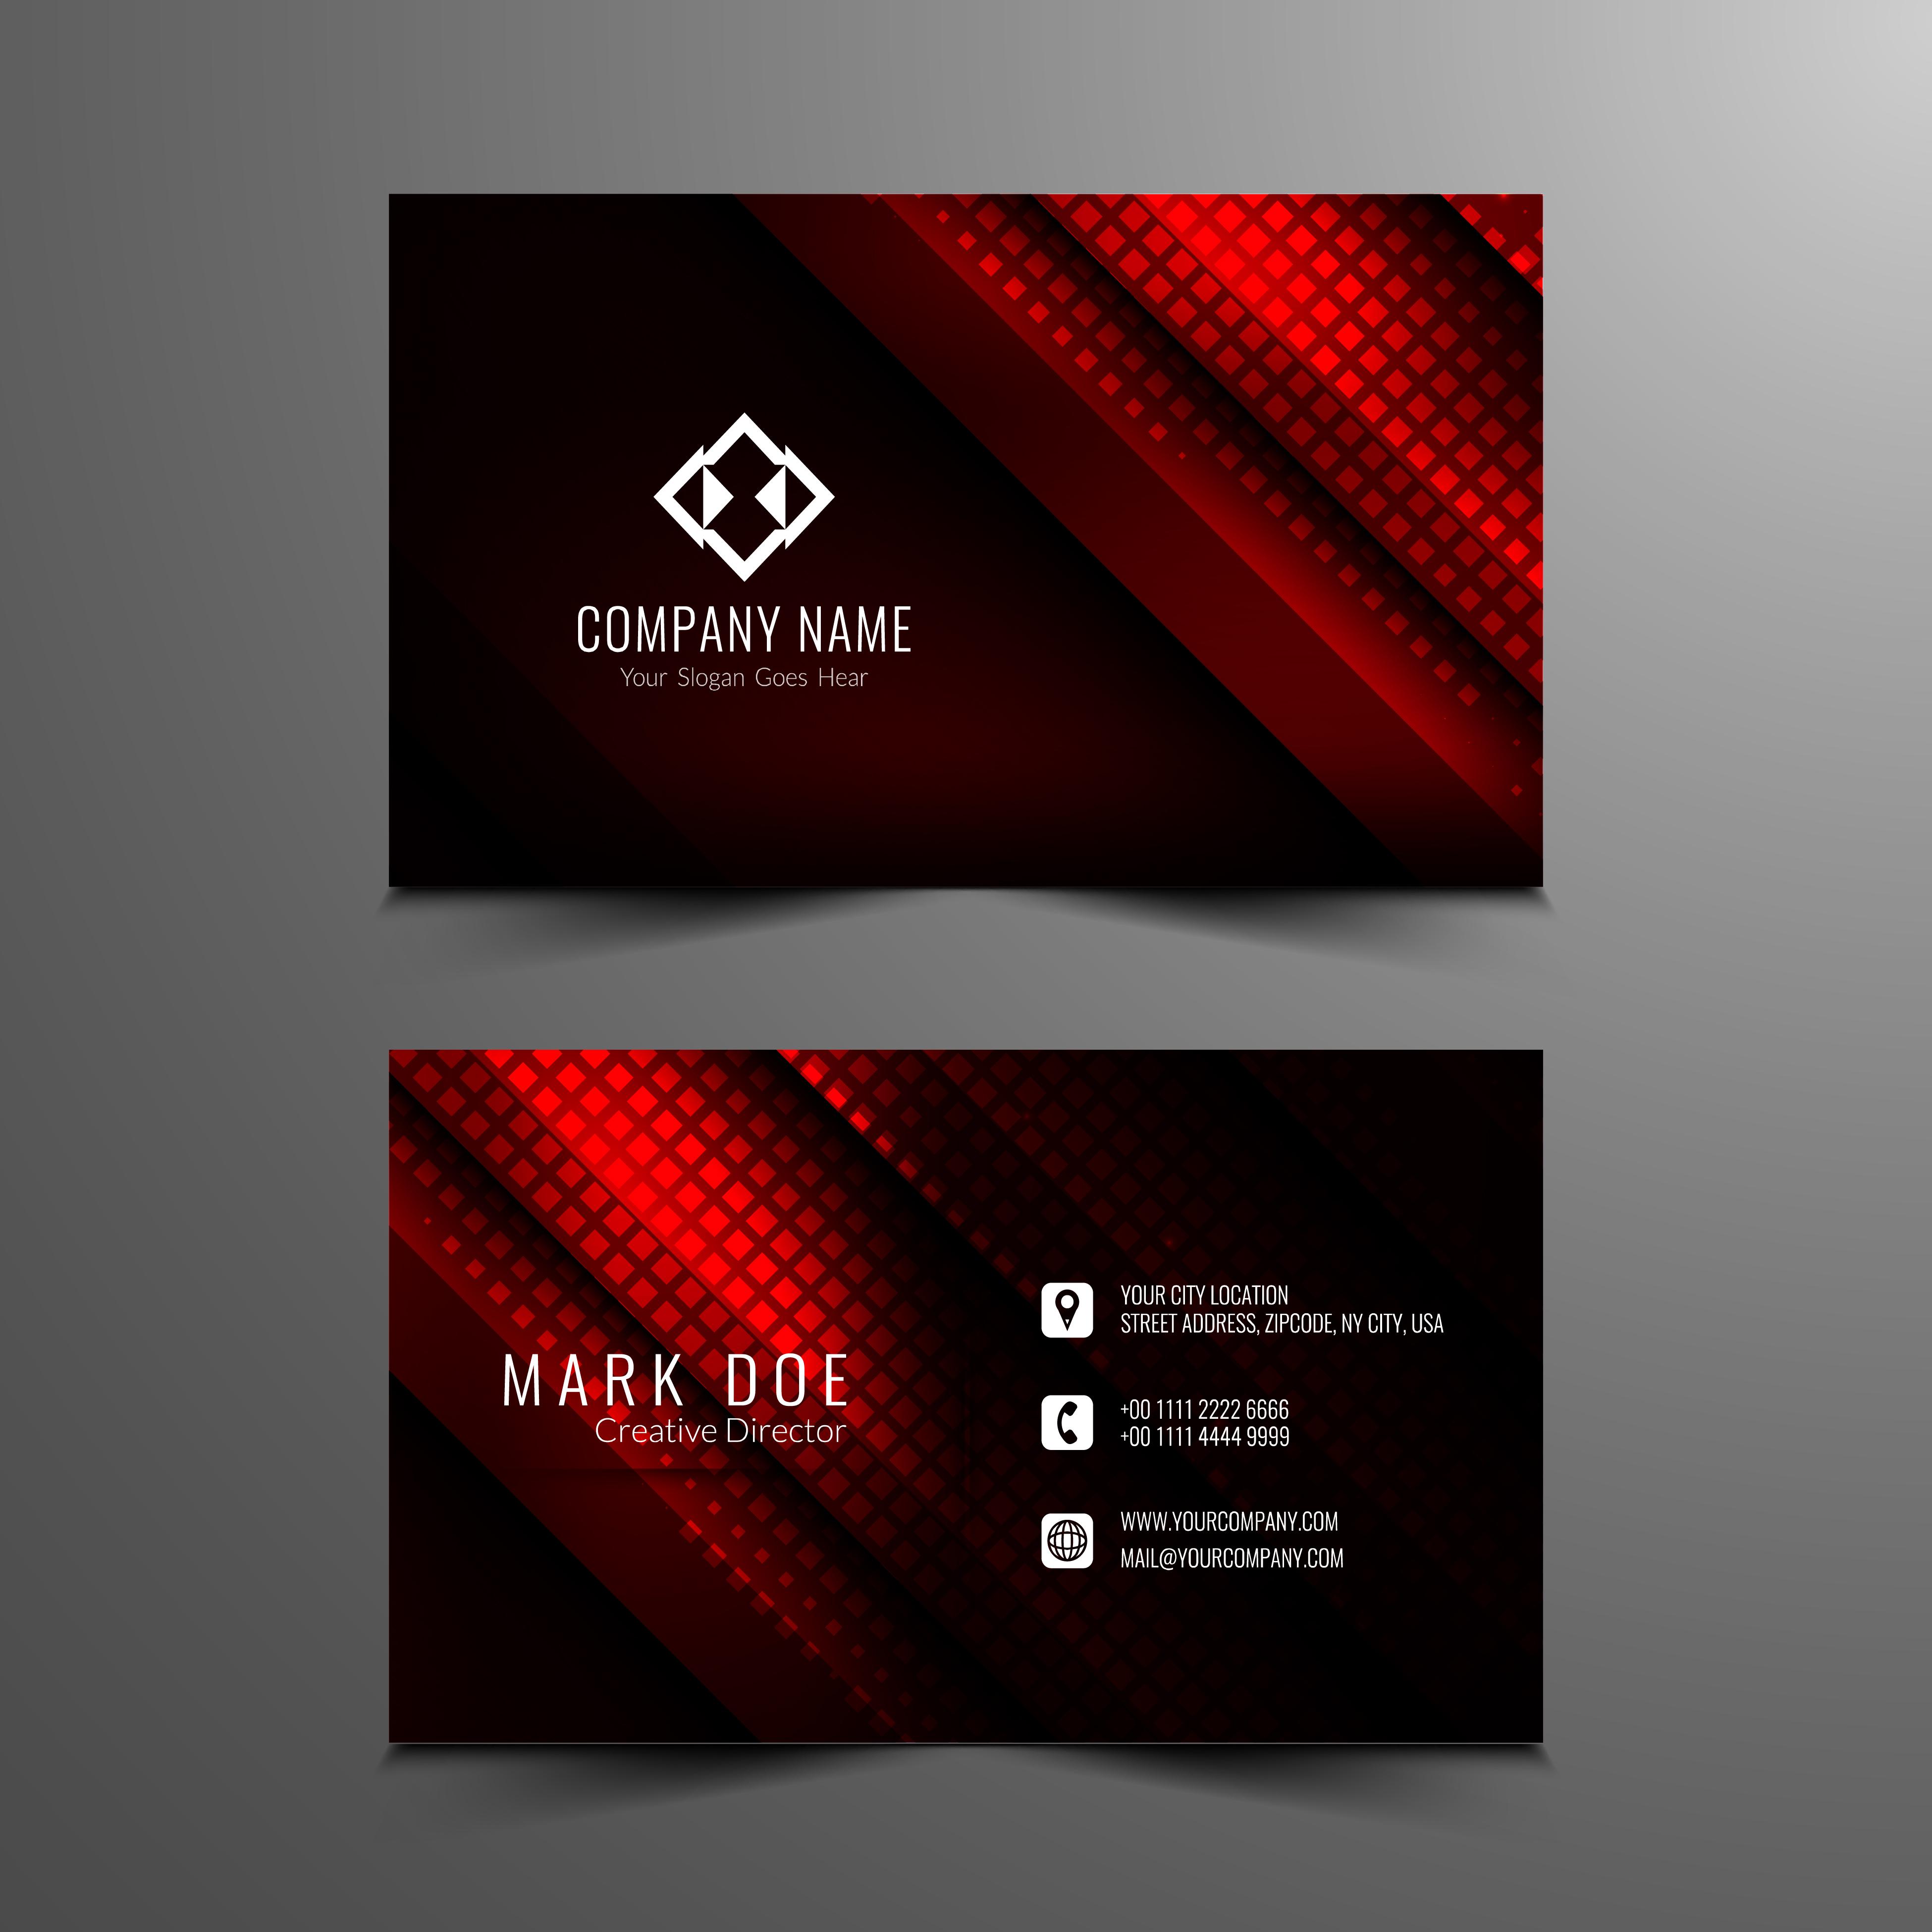 Abstract Modern Business Card Template Design